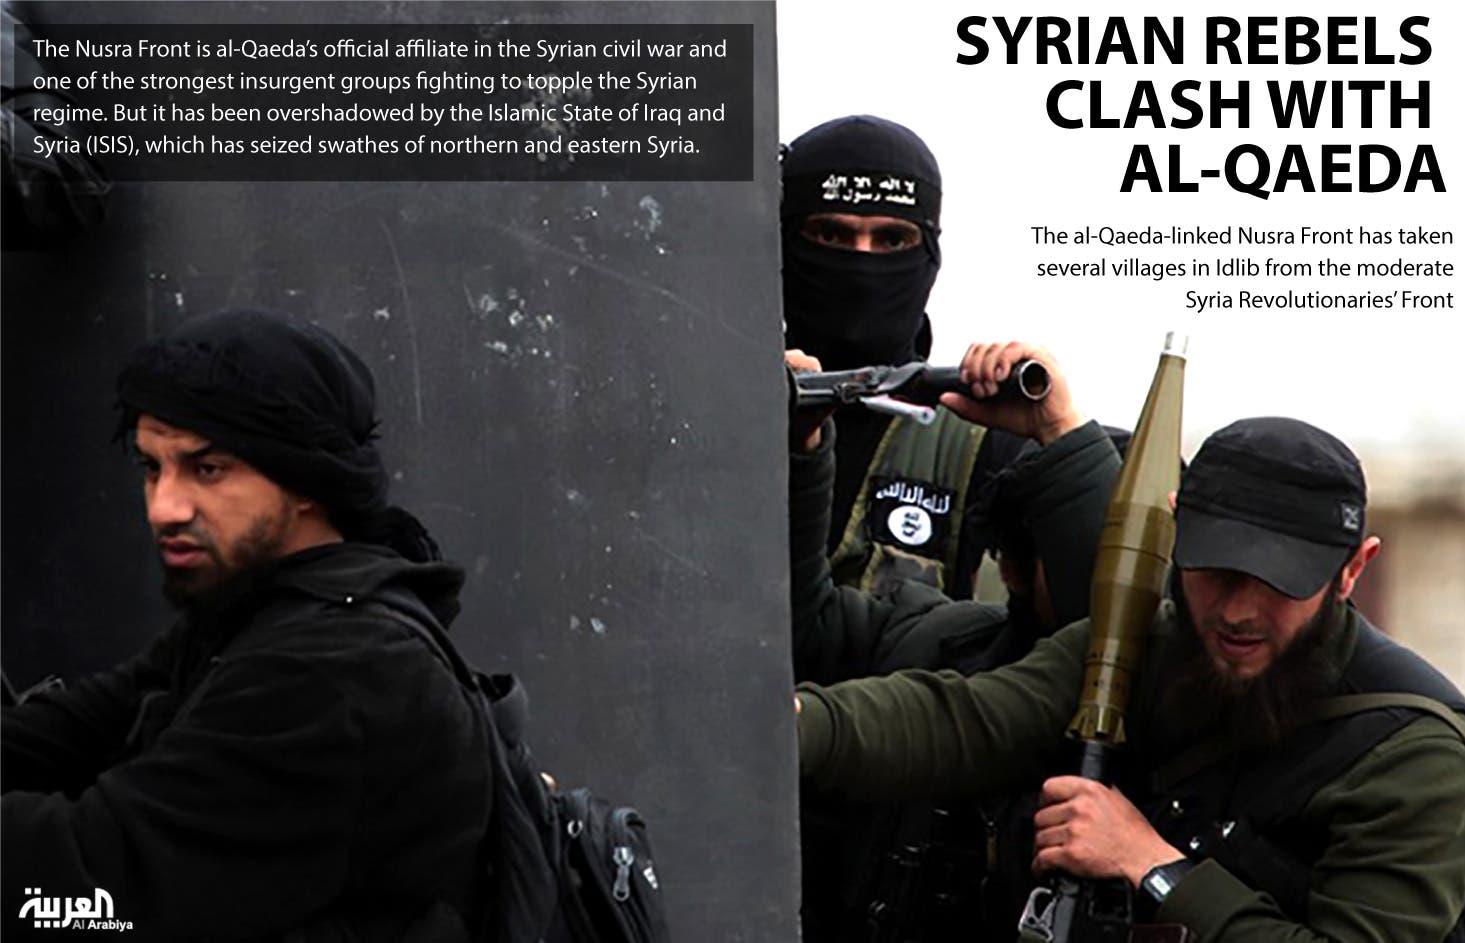 Infographic: Syrian rebels clash with al-Qaeda